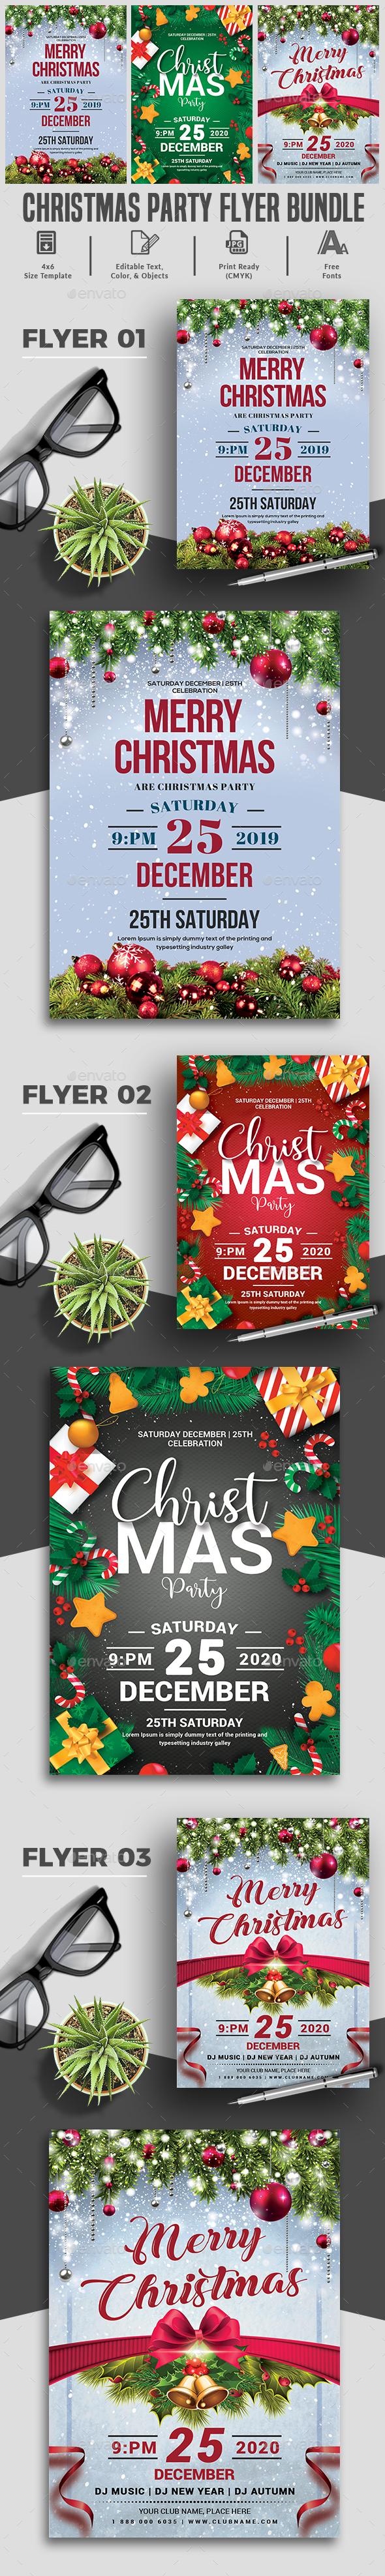 Christmas Party Flyers Bundle